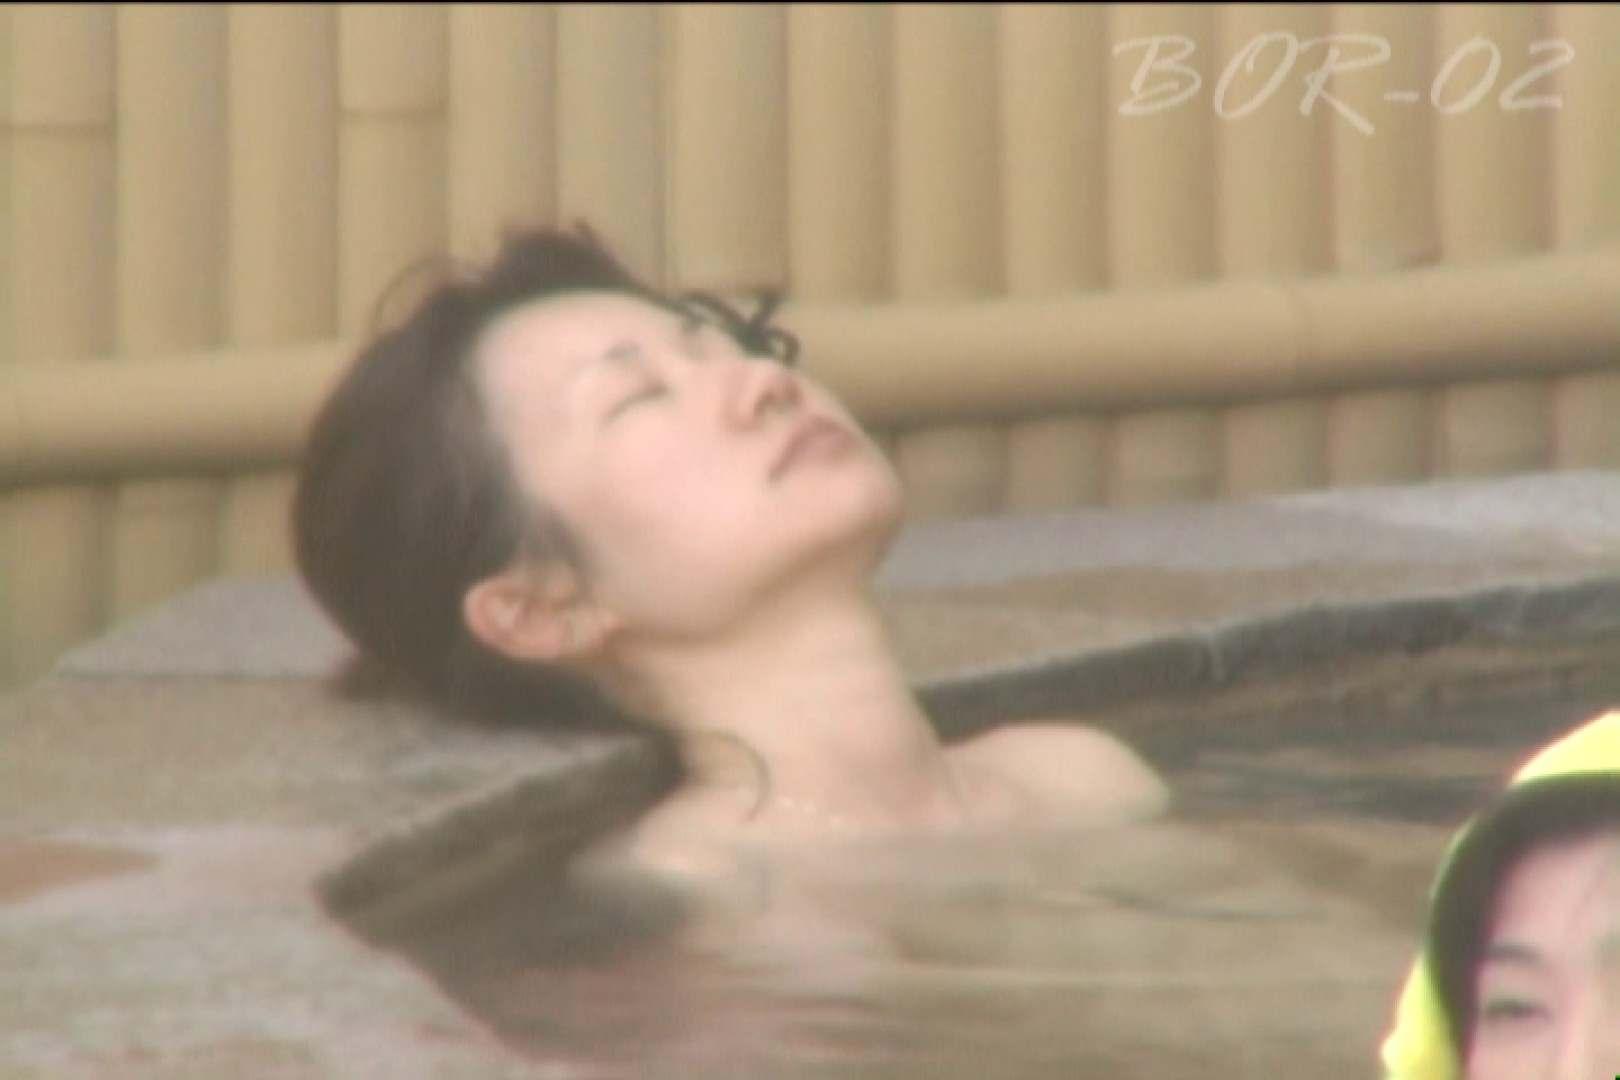 Aquaな露天風呂Vol.477 0  28連発 12